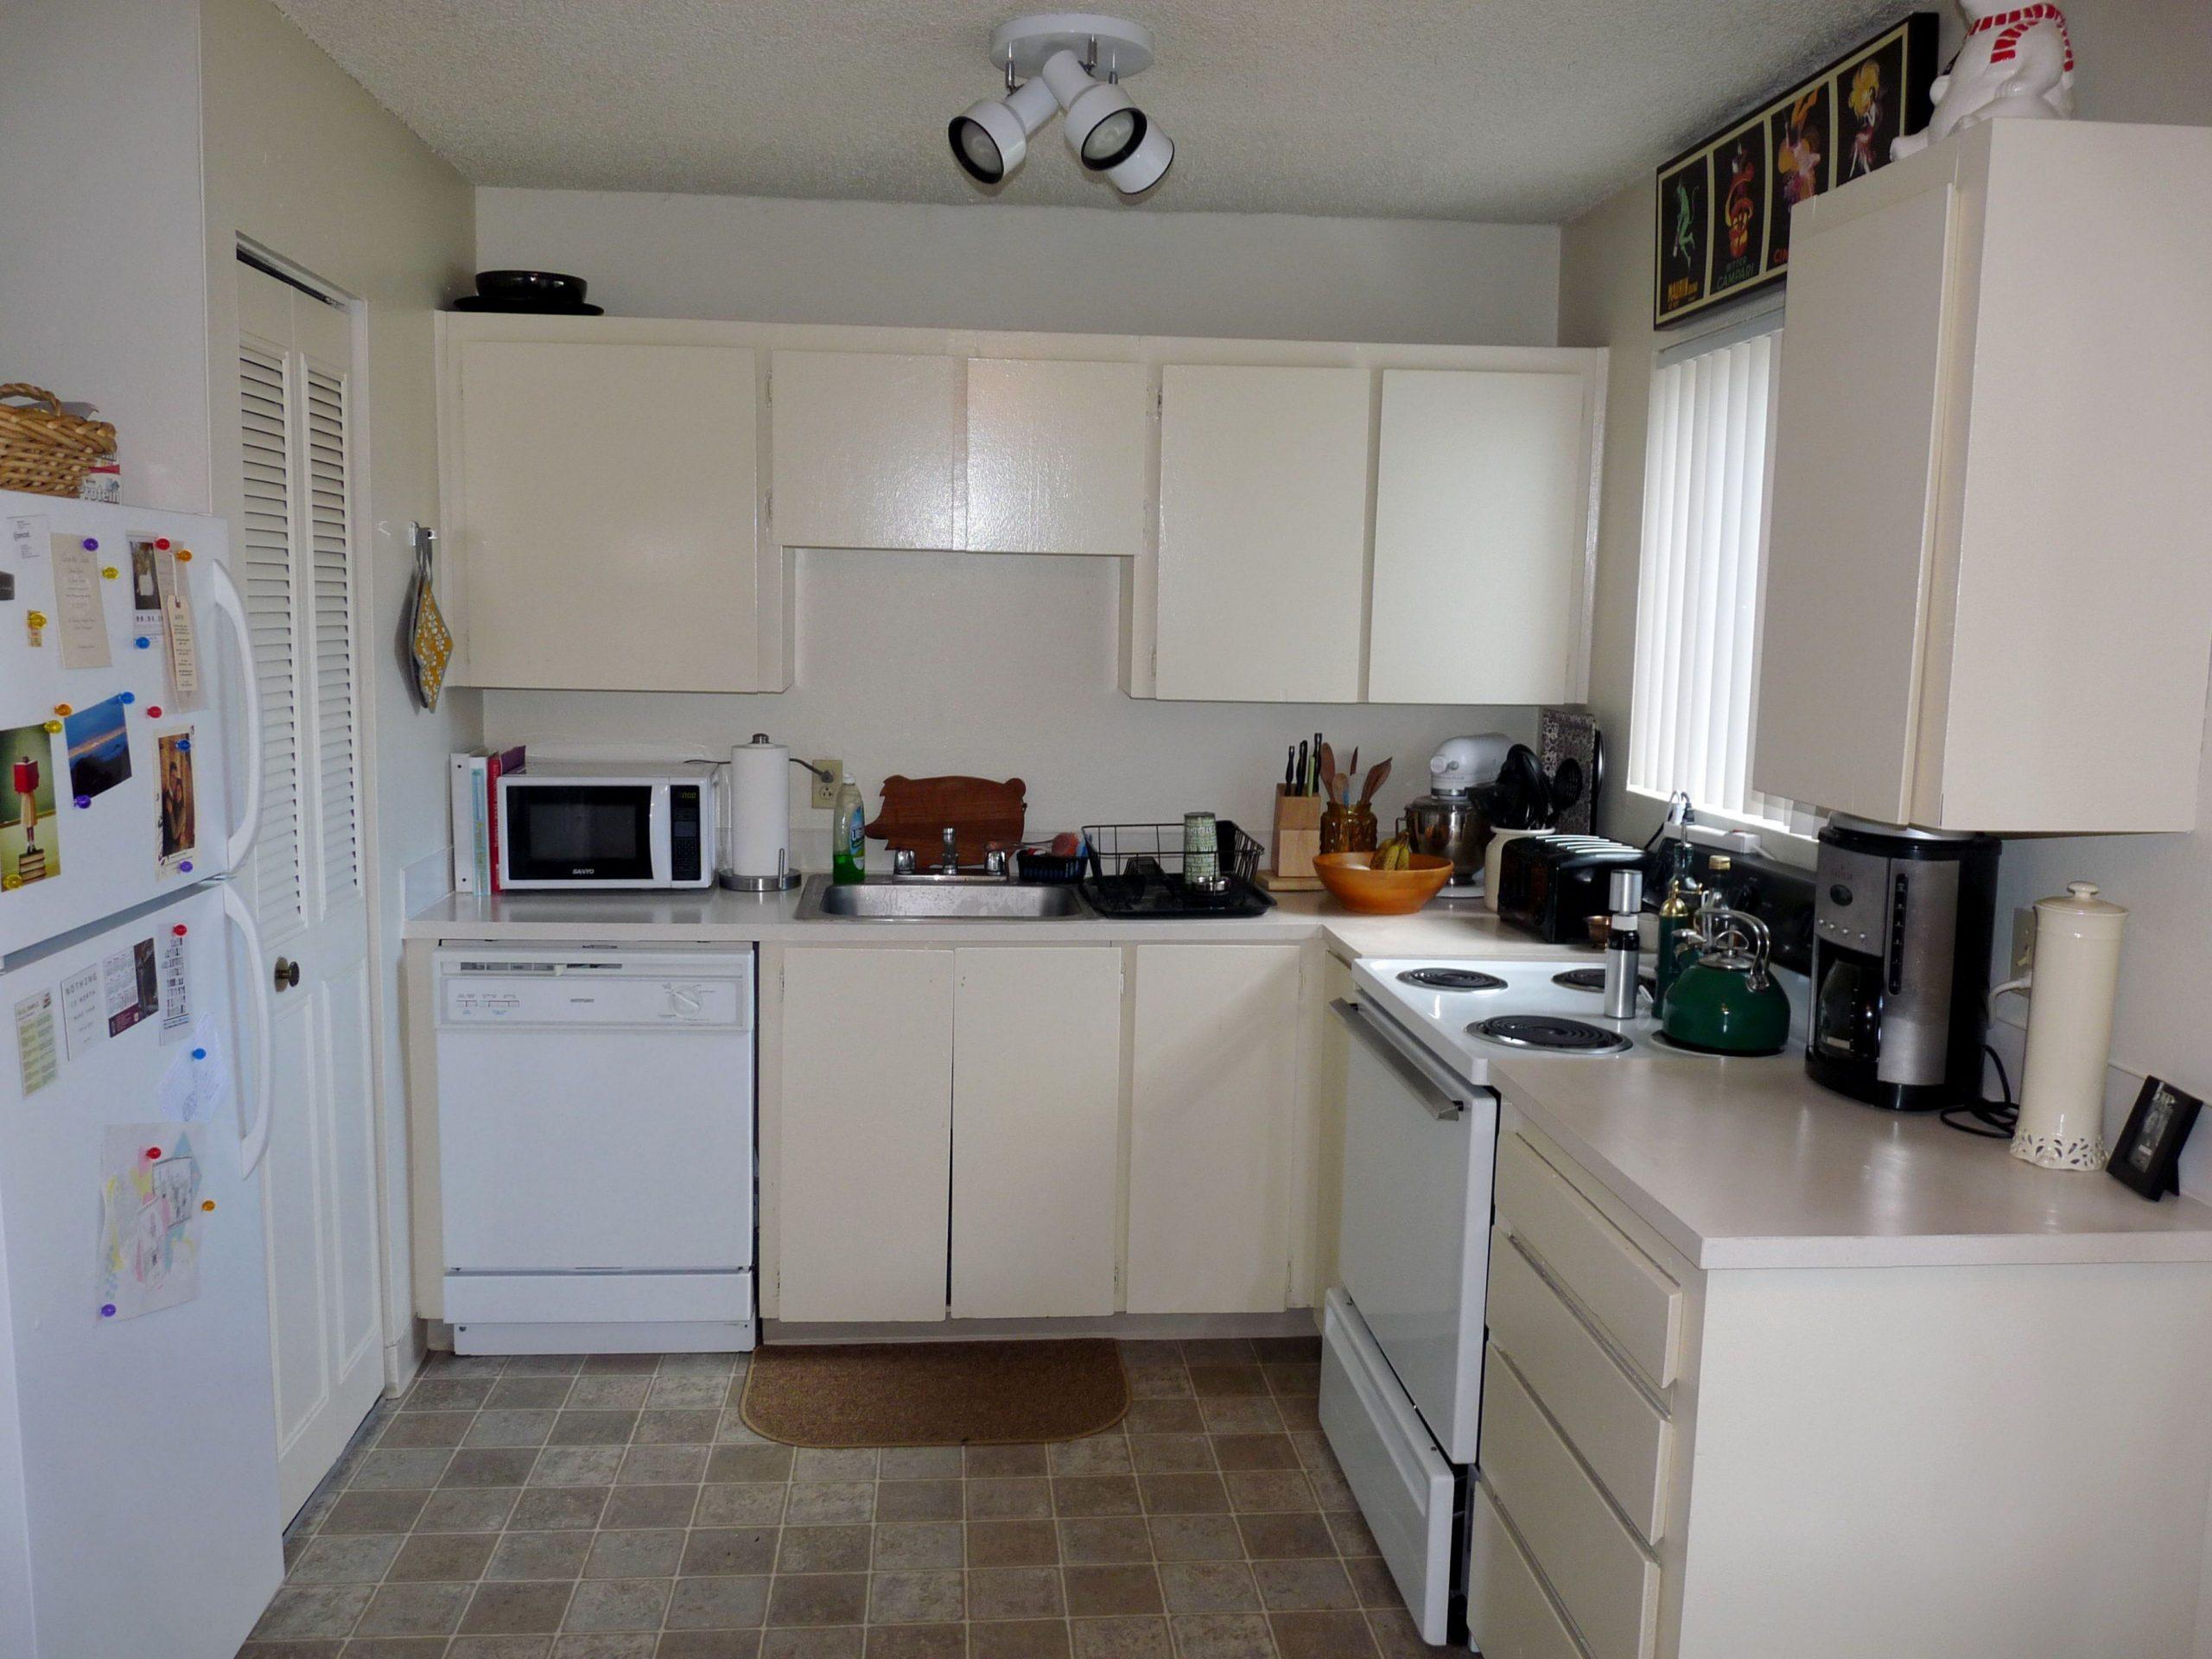 Apartment Kitchen Decorating Ideas Endearing Inspiration Small  - Small Apartment Kitchen Decor Ideas